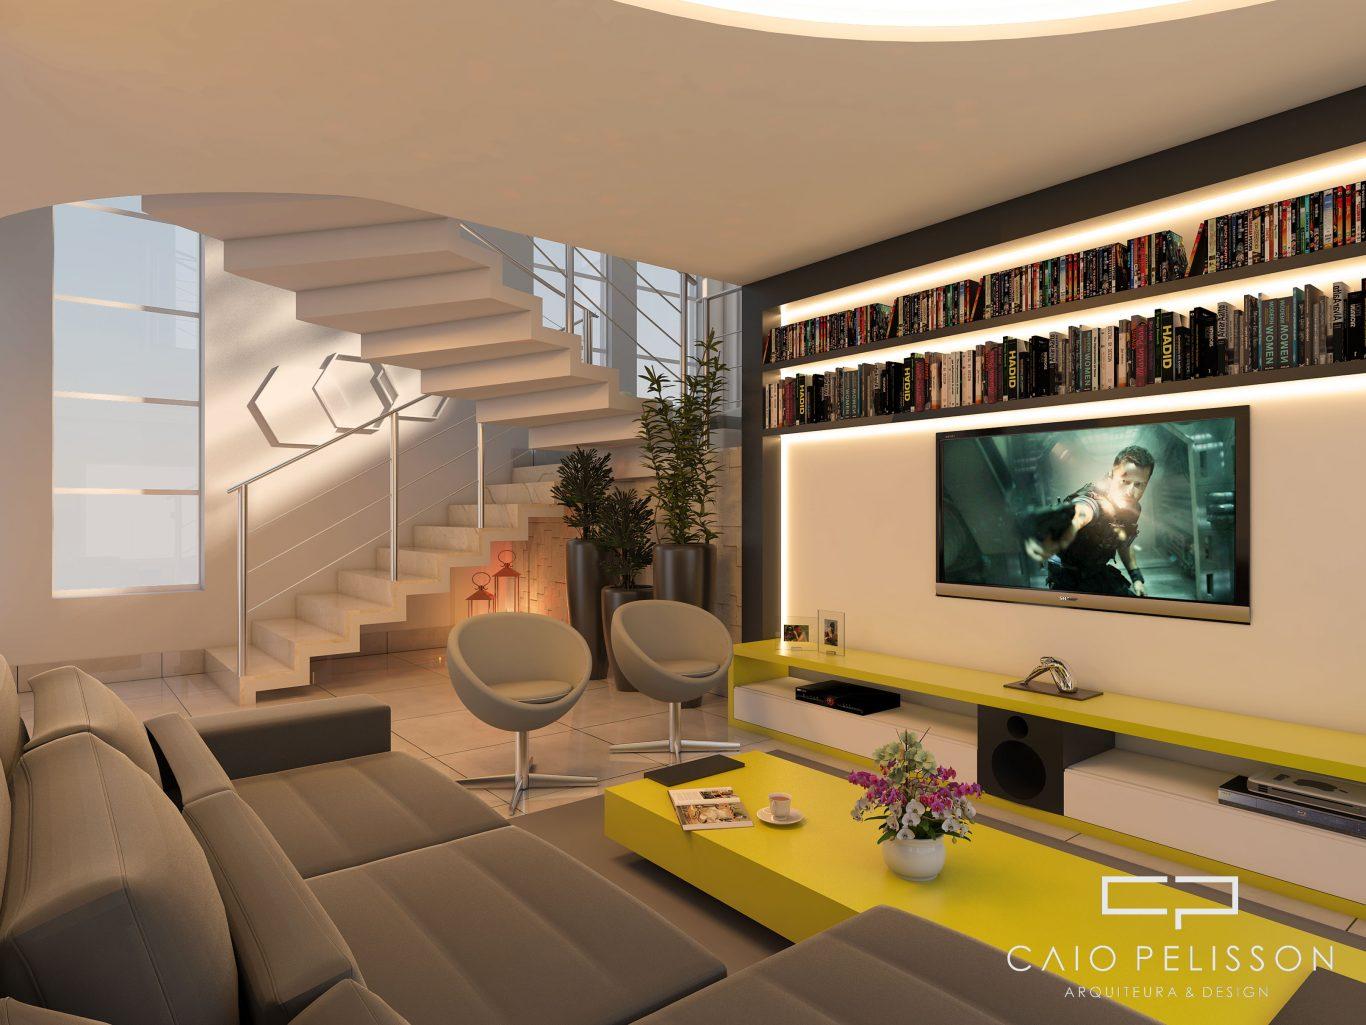 Projeto Decora O Design Interiores Ambiente Campinas